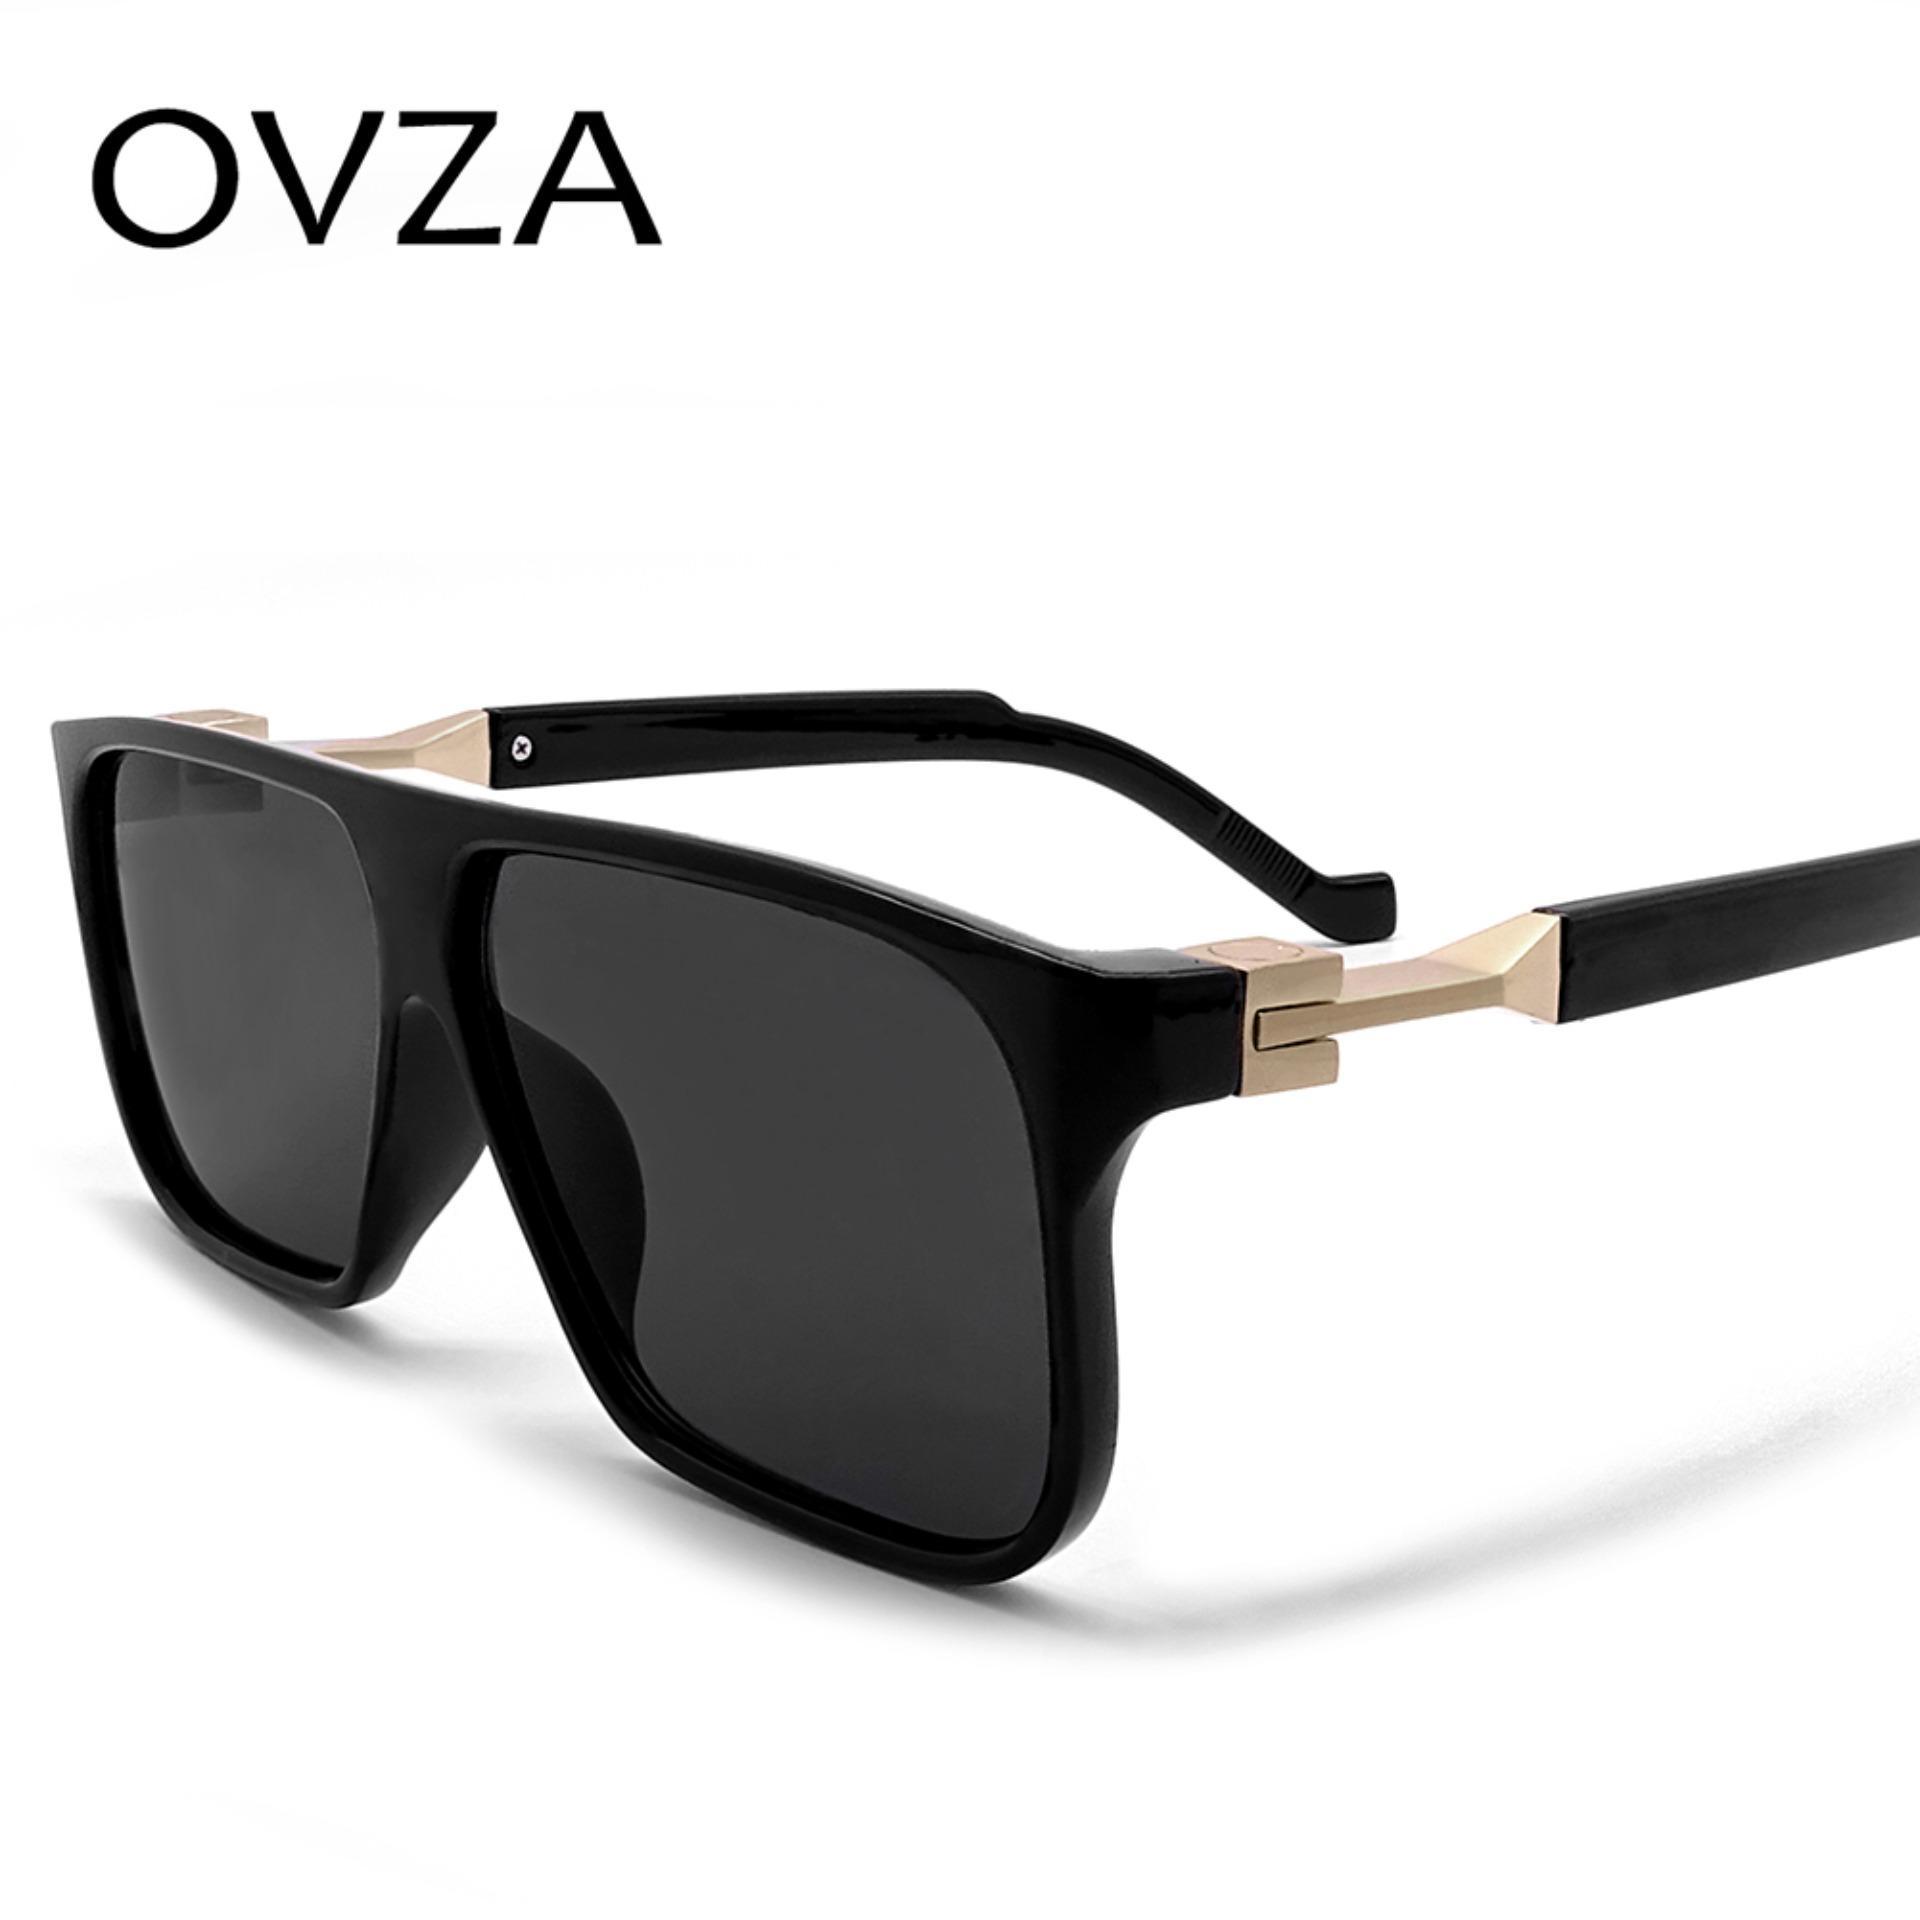 1bfdd4a6a633 OVZA Futuristic Style Rectangle Fashion Mens Sun glasses Women Brand  Designer Mirror Sunglasses High quality Flat